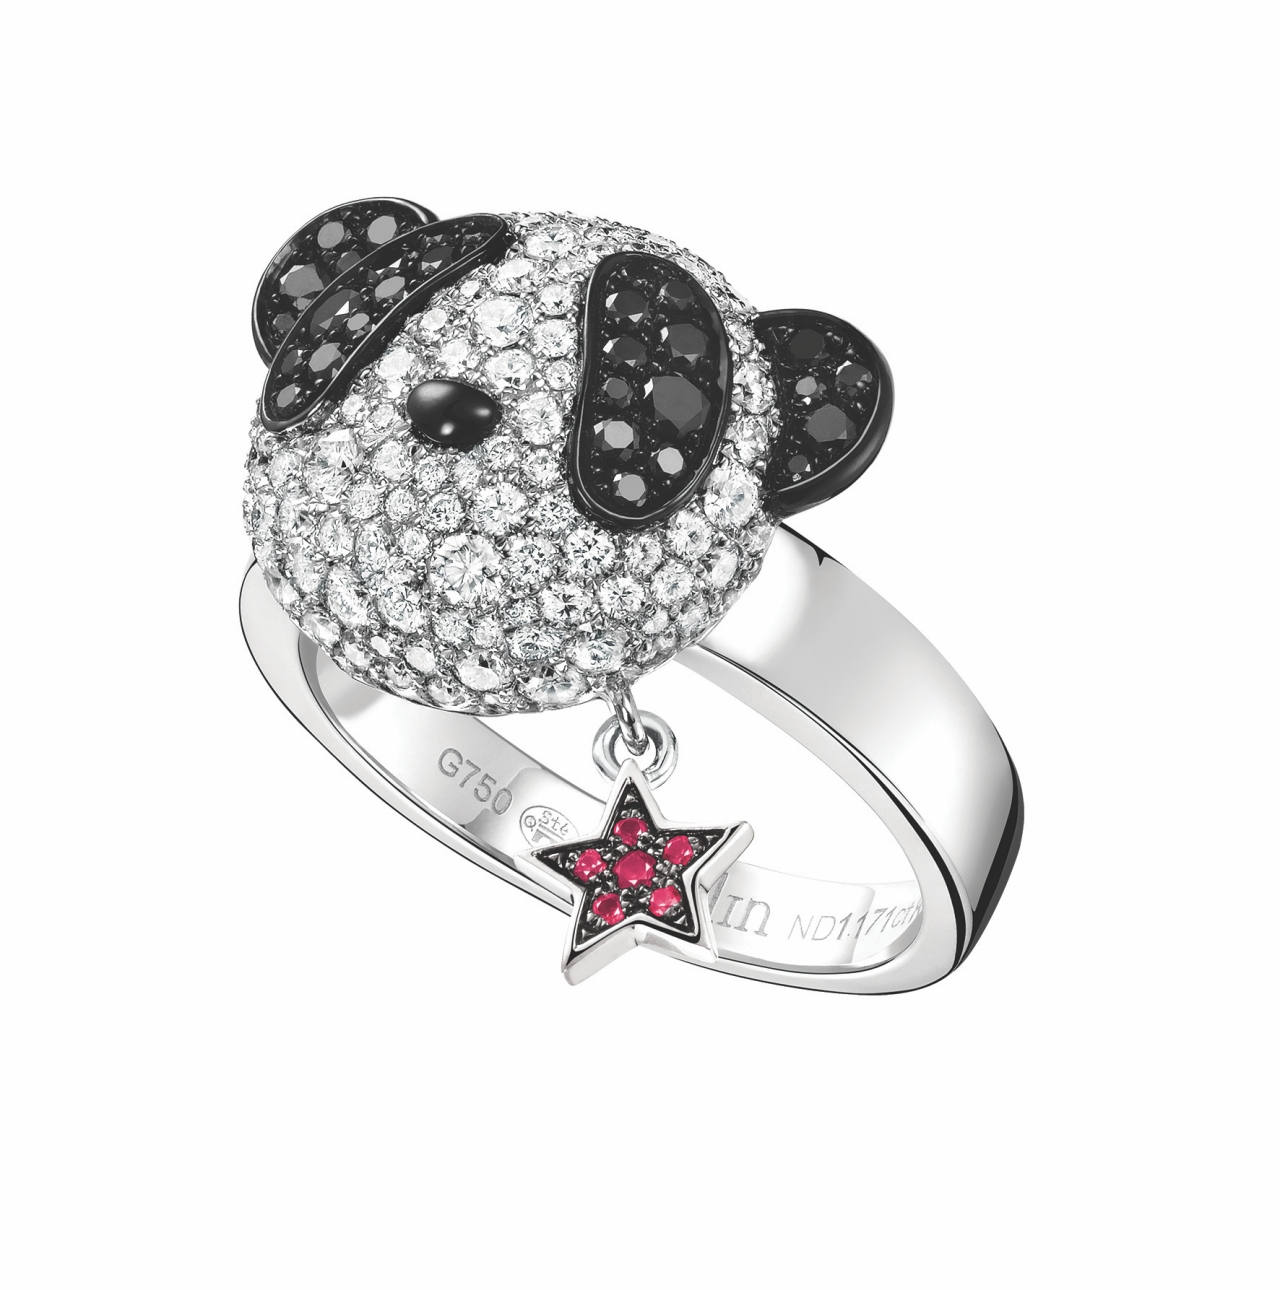 Qeelin_Small Classic Bo Bo 18K 白金鑲鑽及黑鑽石戒指 NTD339,000 (BB-030-RIAS-WGDRU)_batch